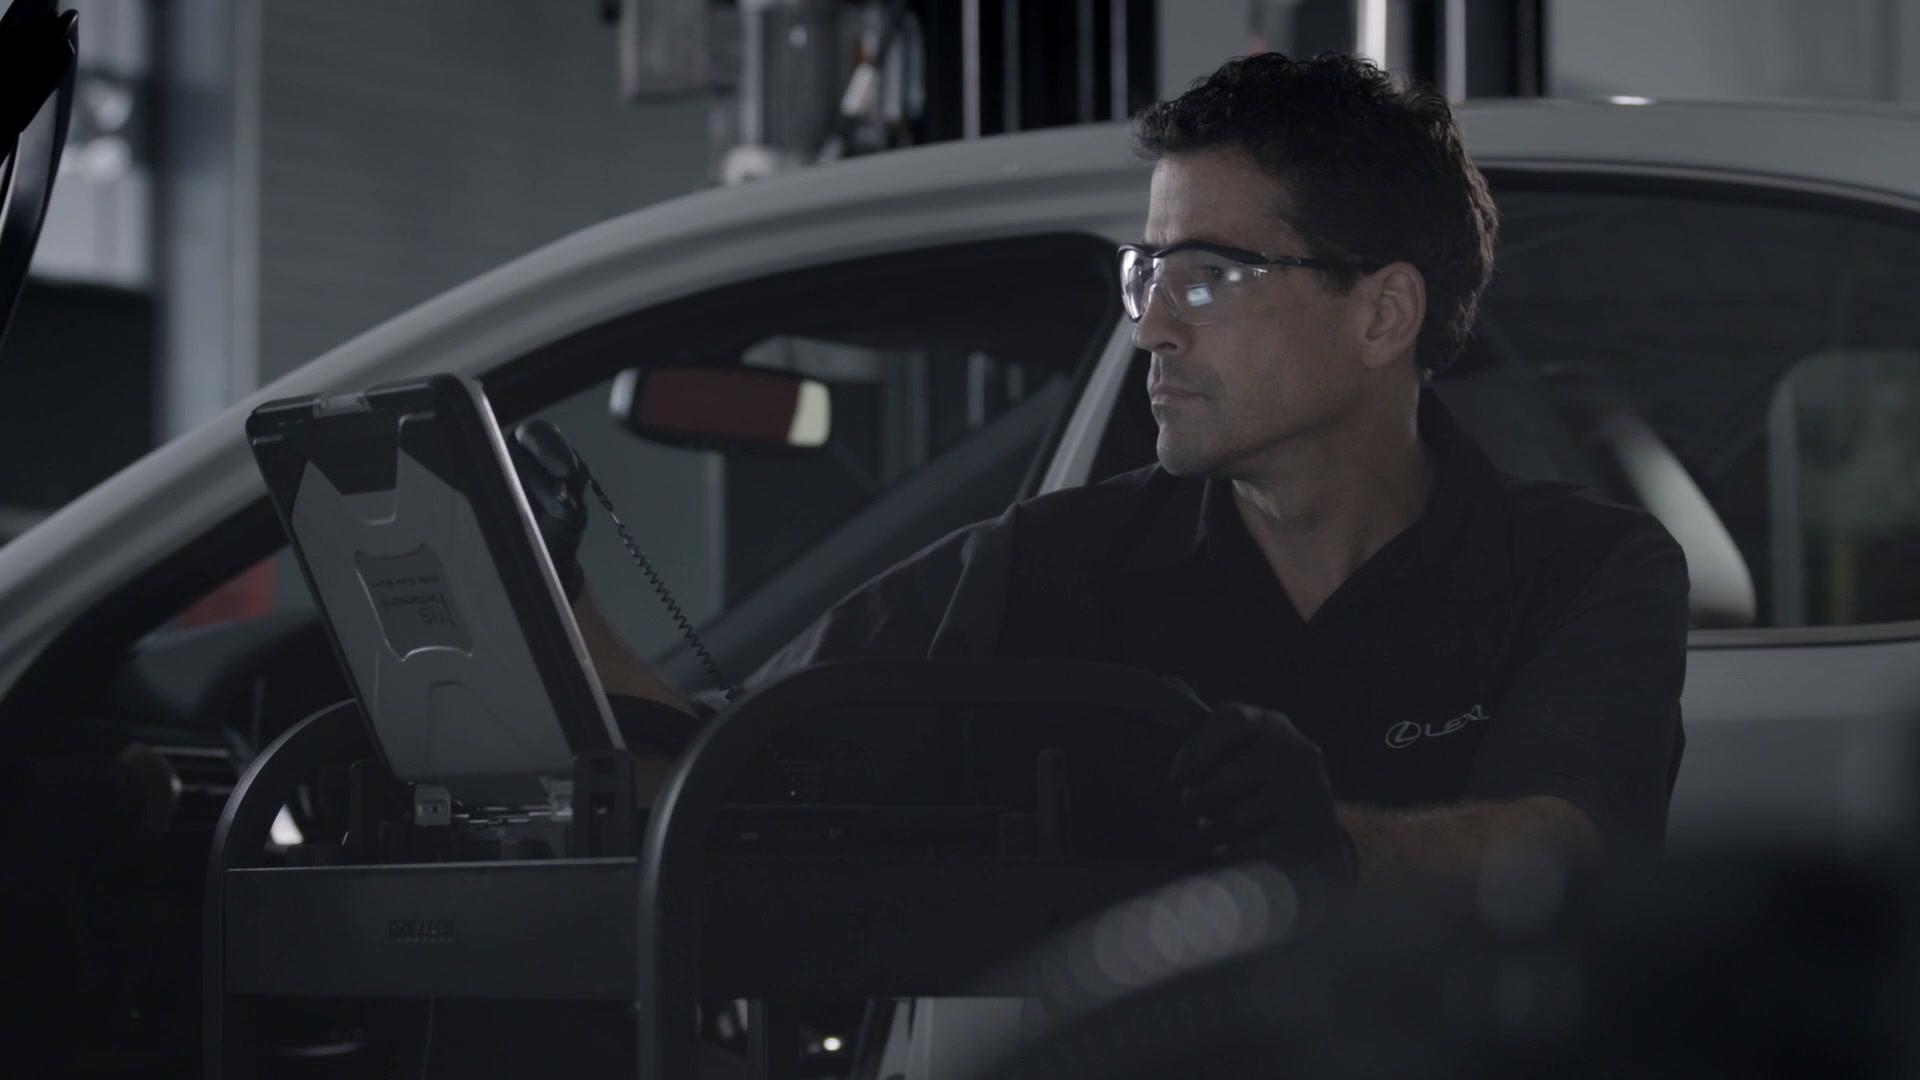 Lexus maintenance required light